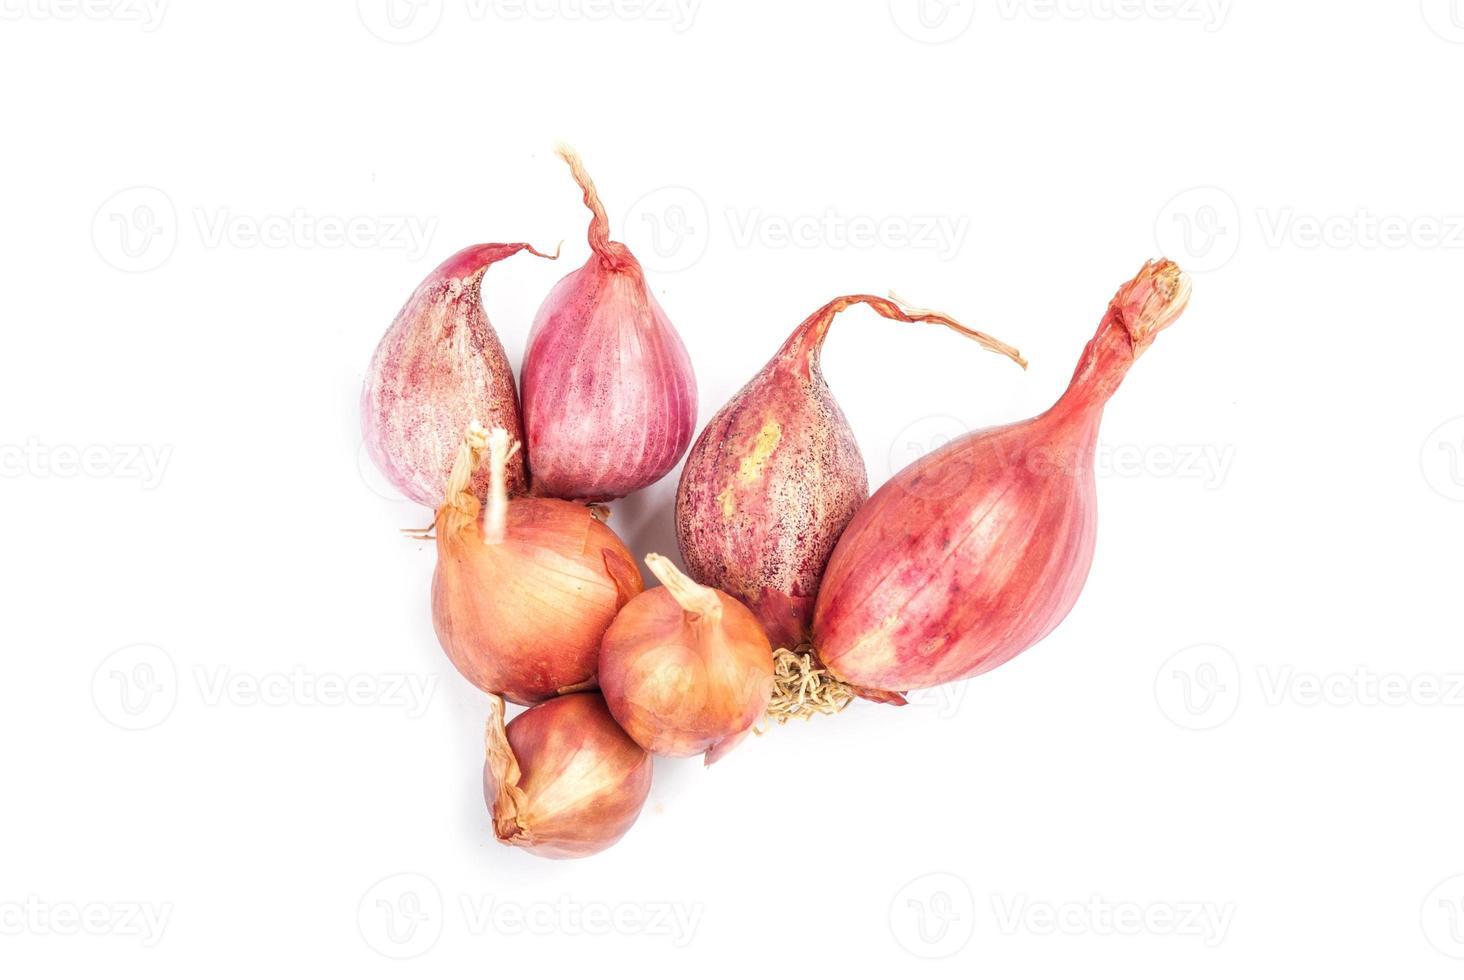 Shallot onions photo